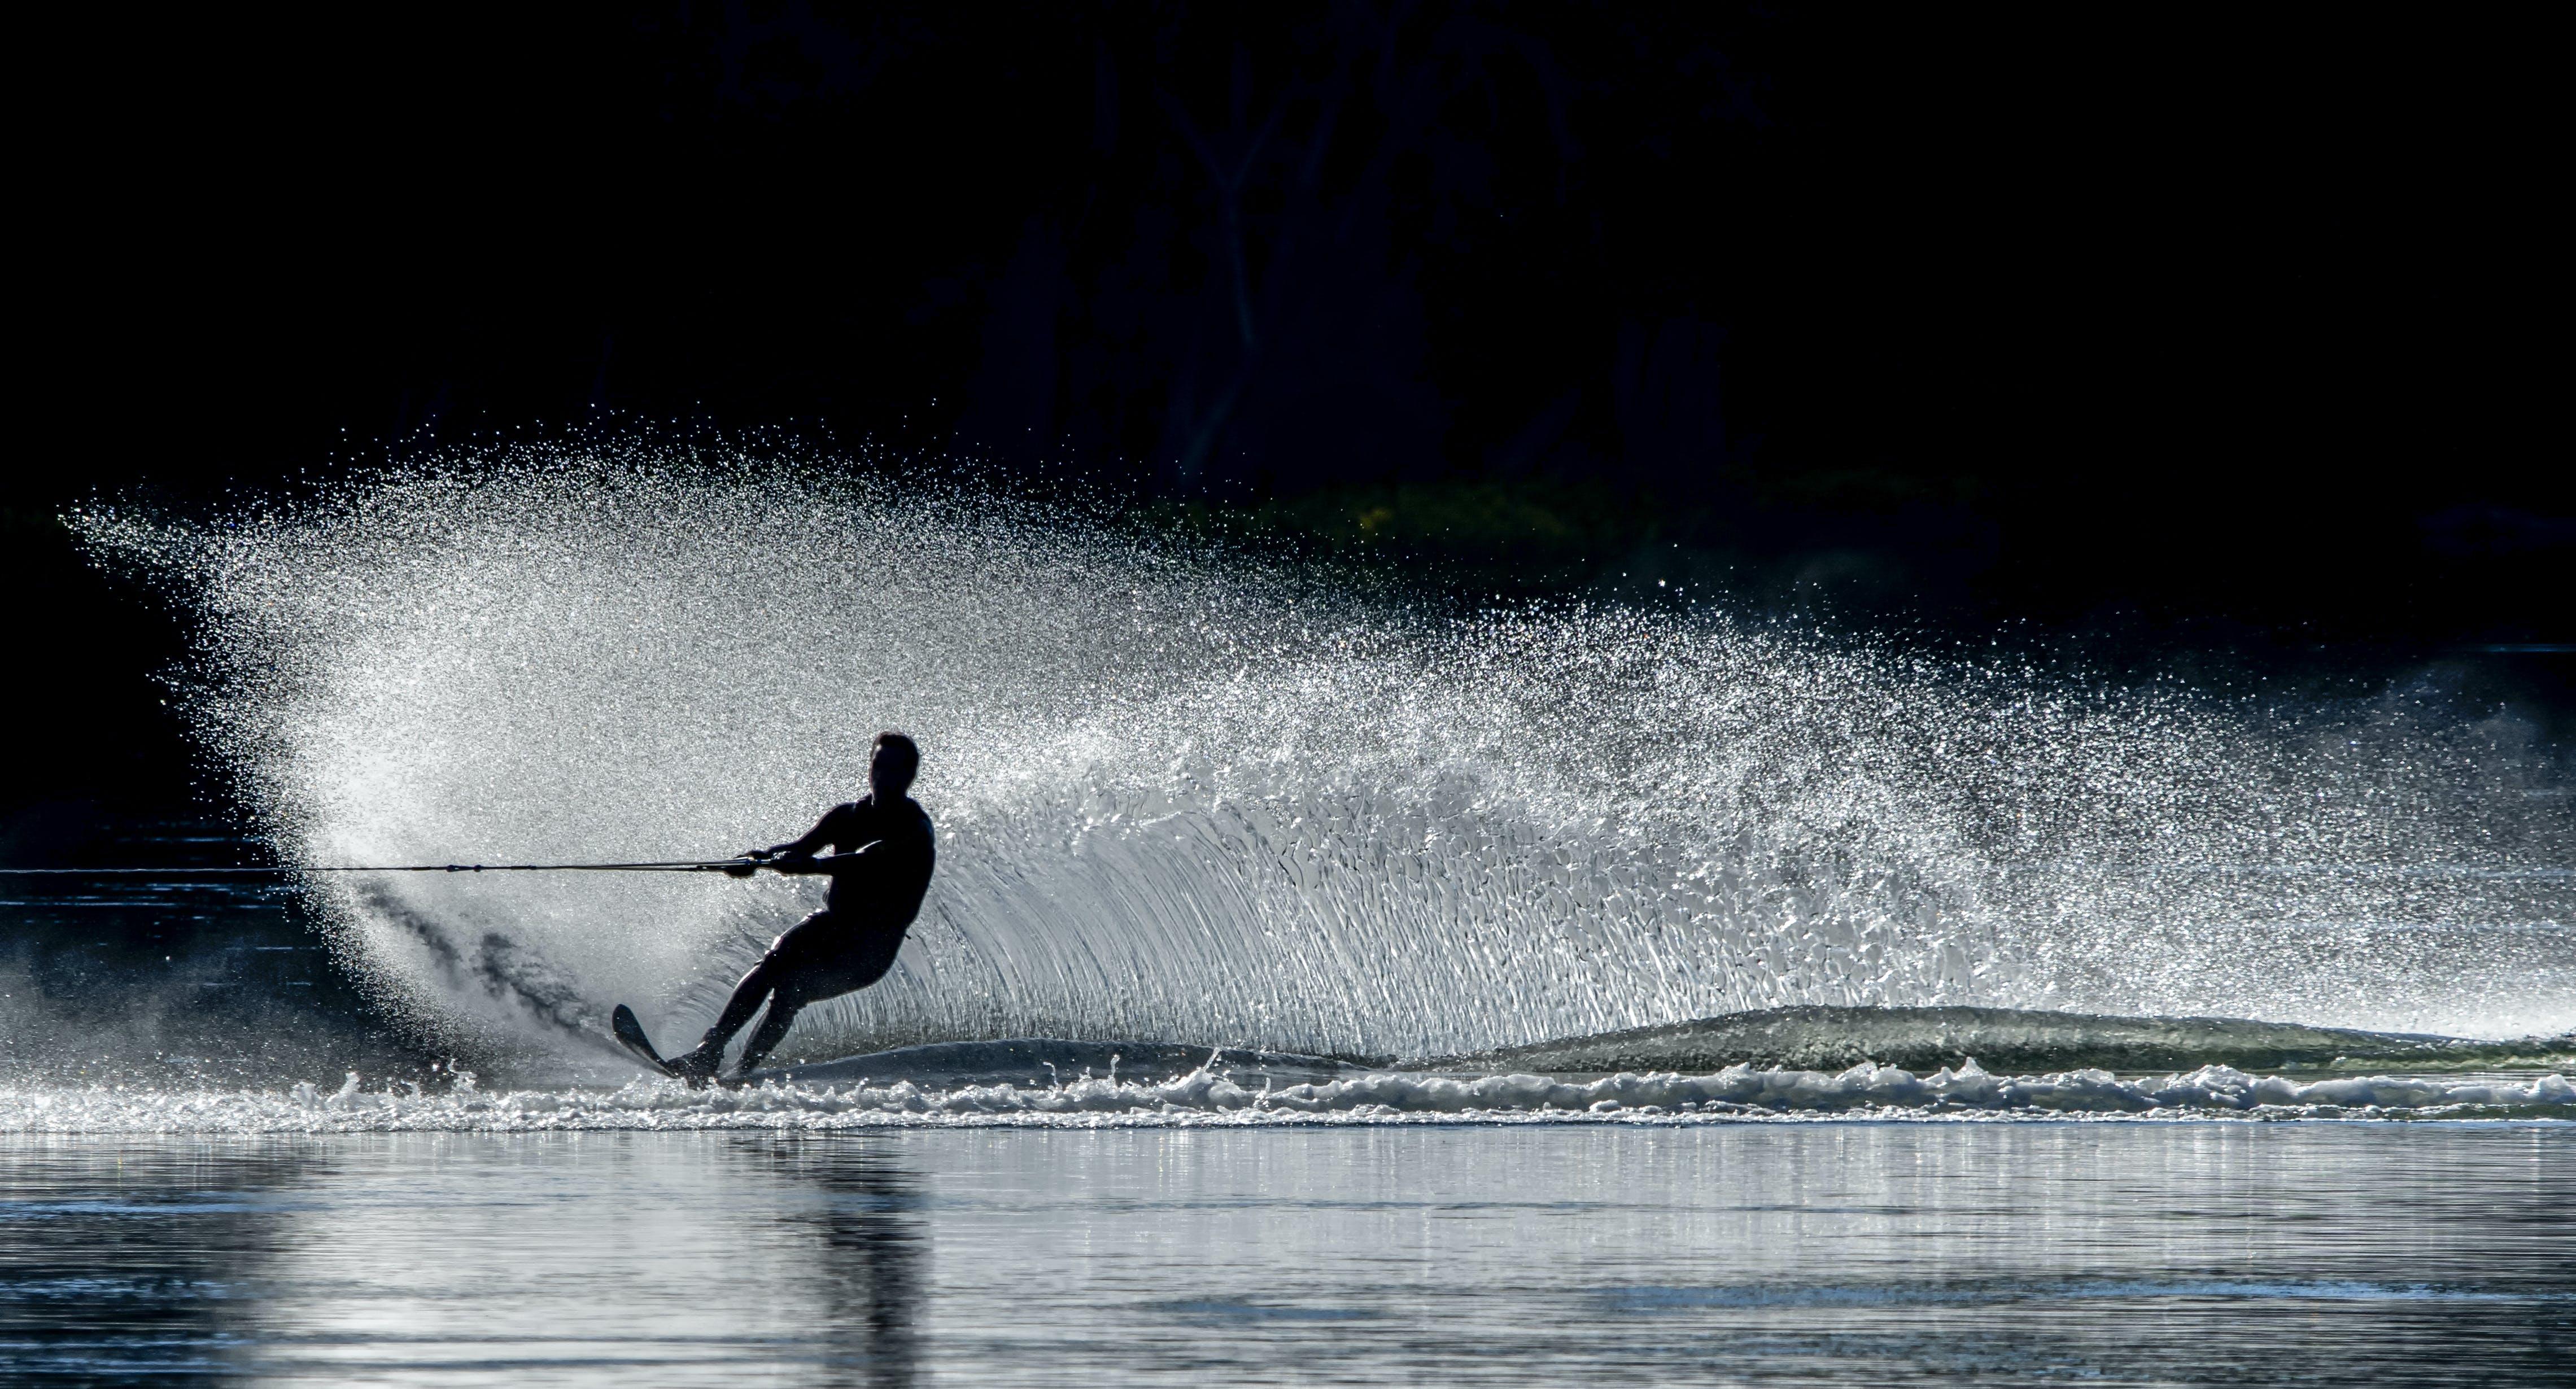 Person Water Skiing at Night